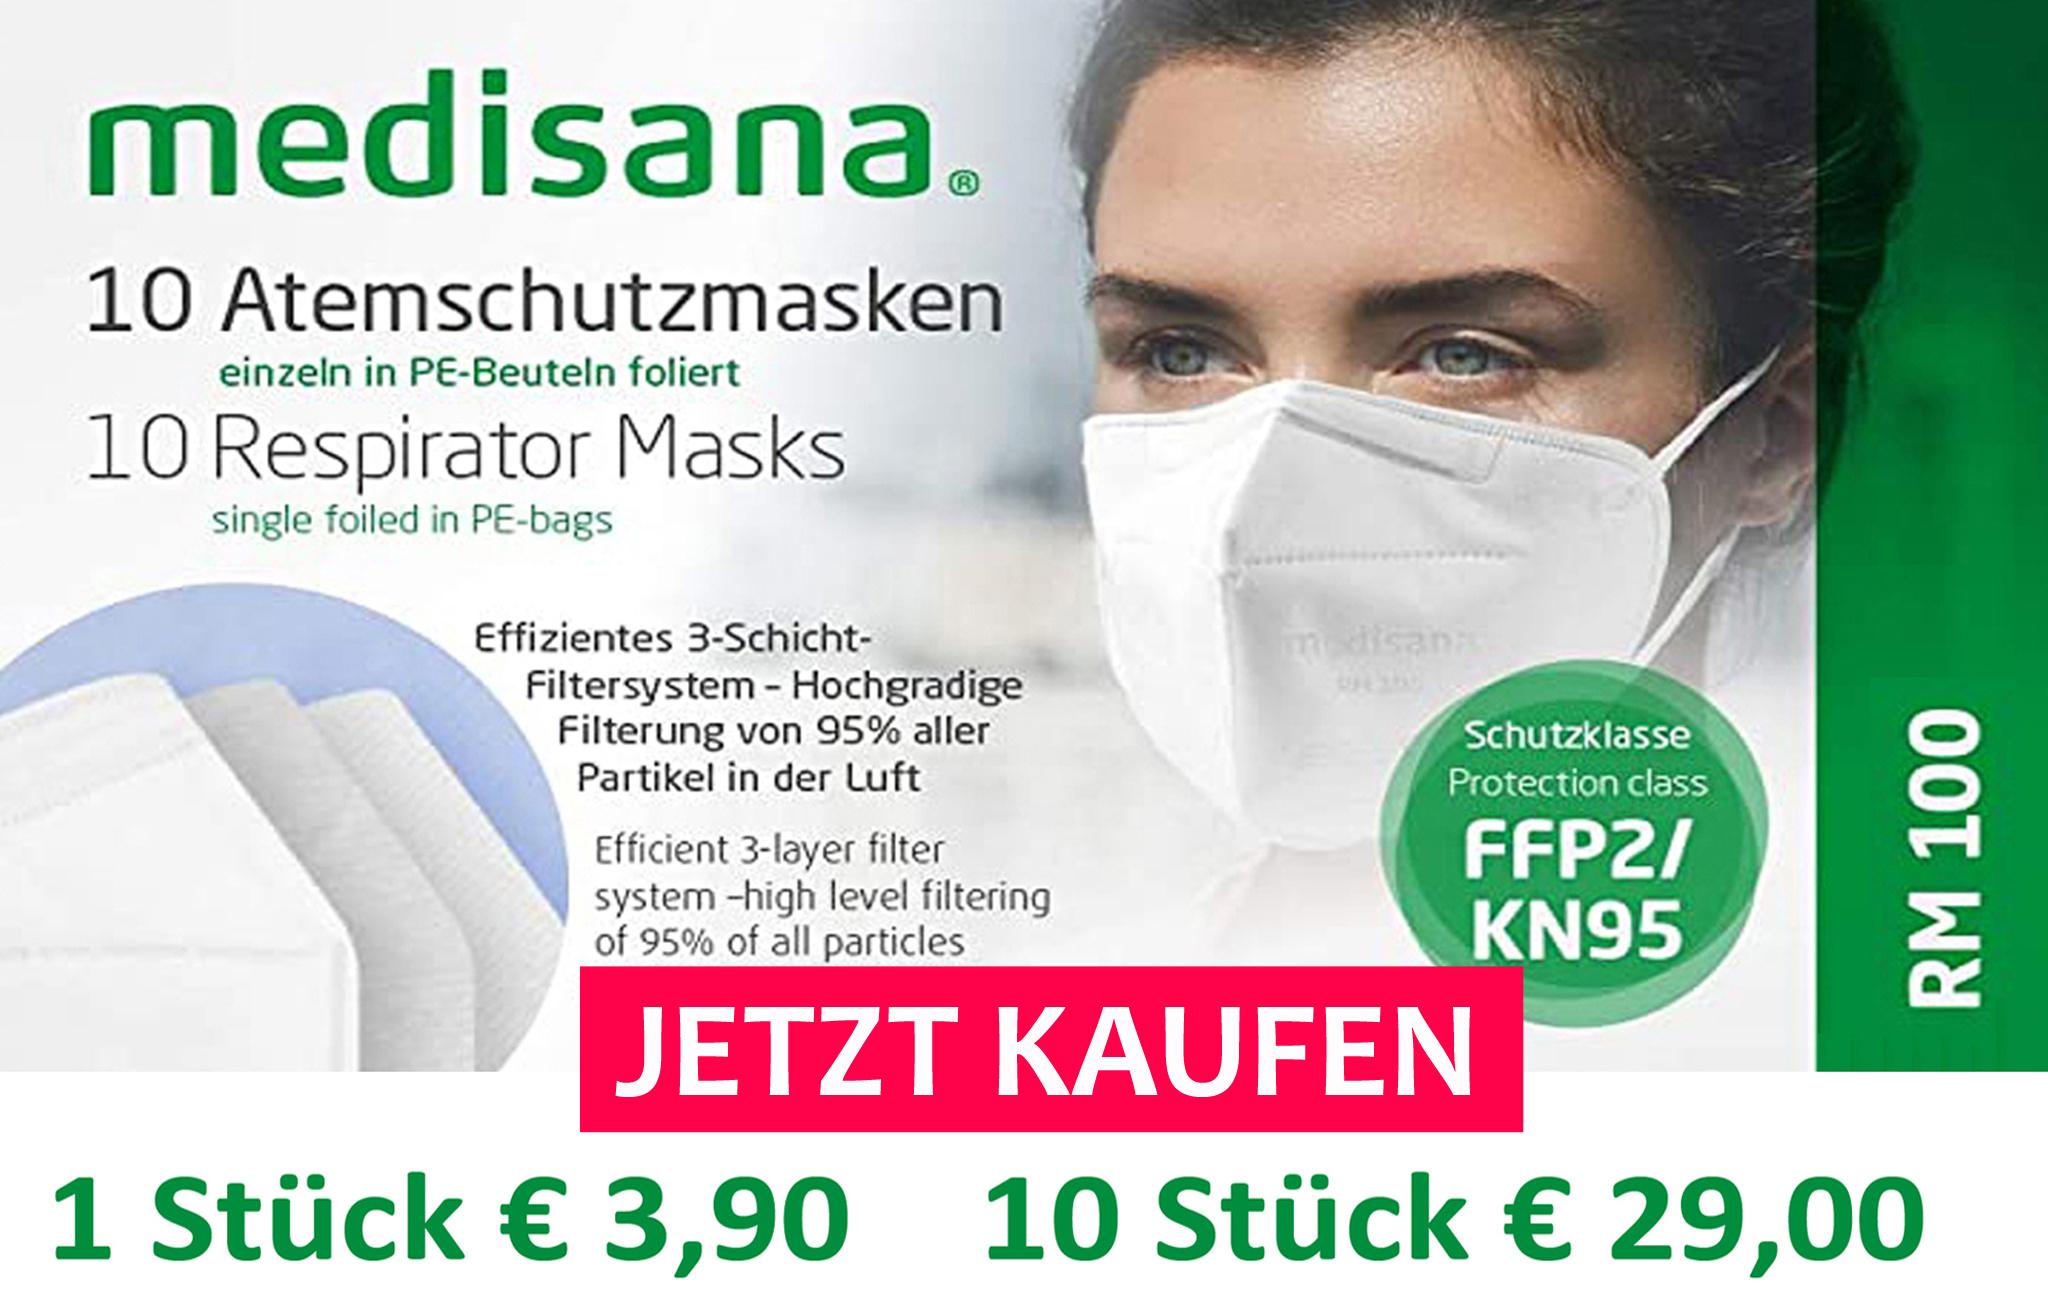 Atemschutzmaske Medisana FFP2 Maske kaufen